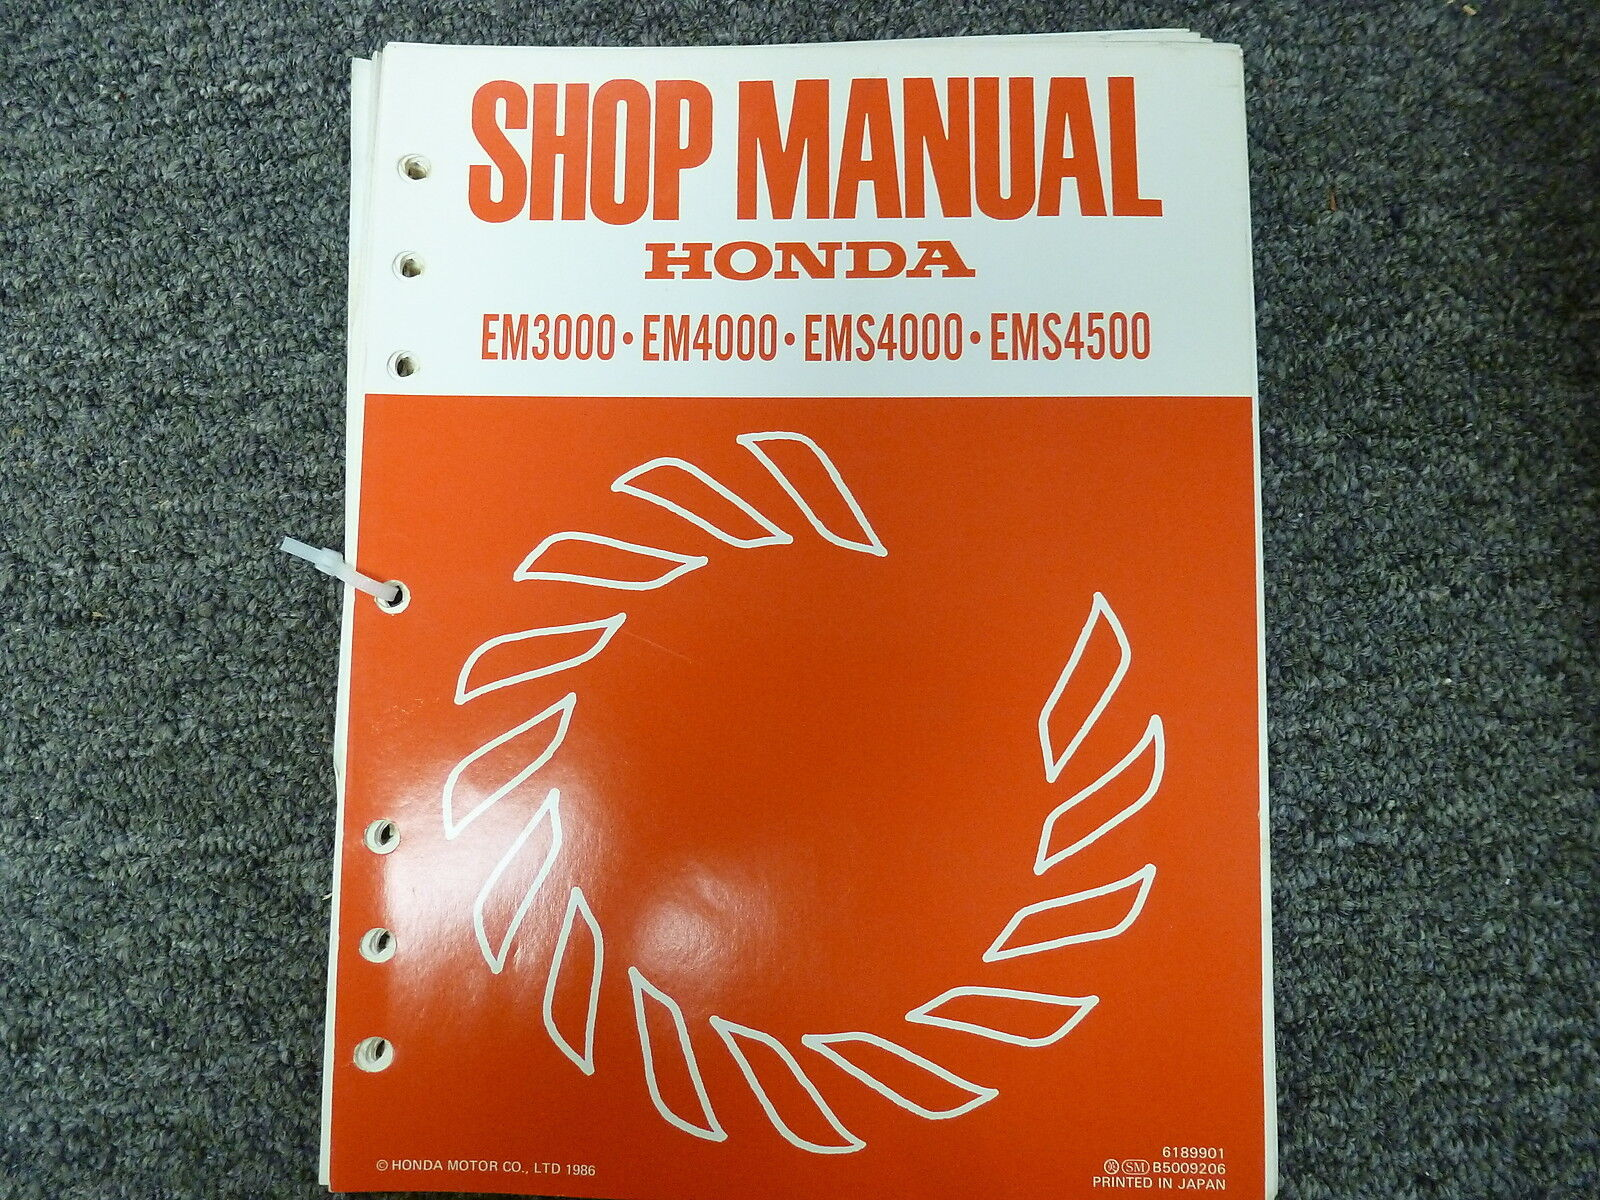 honda em3000 4000 ems4000 4500 generator service repair shop manual rh ebay com GCV160 Service Manual Honda Motorcycle Service Manual